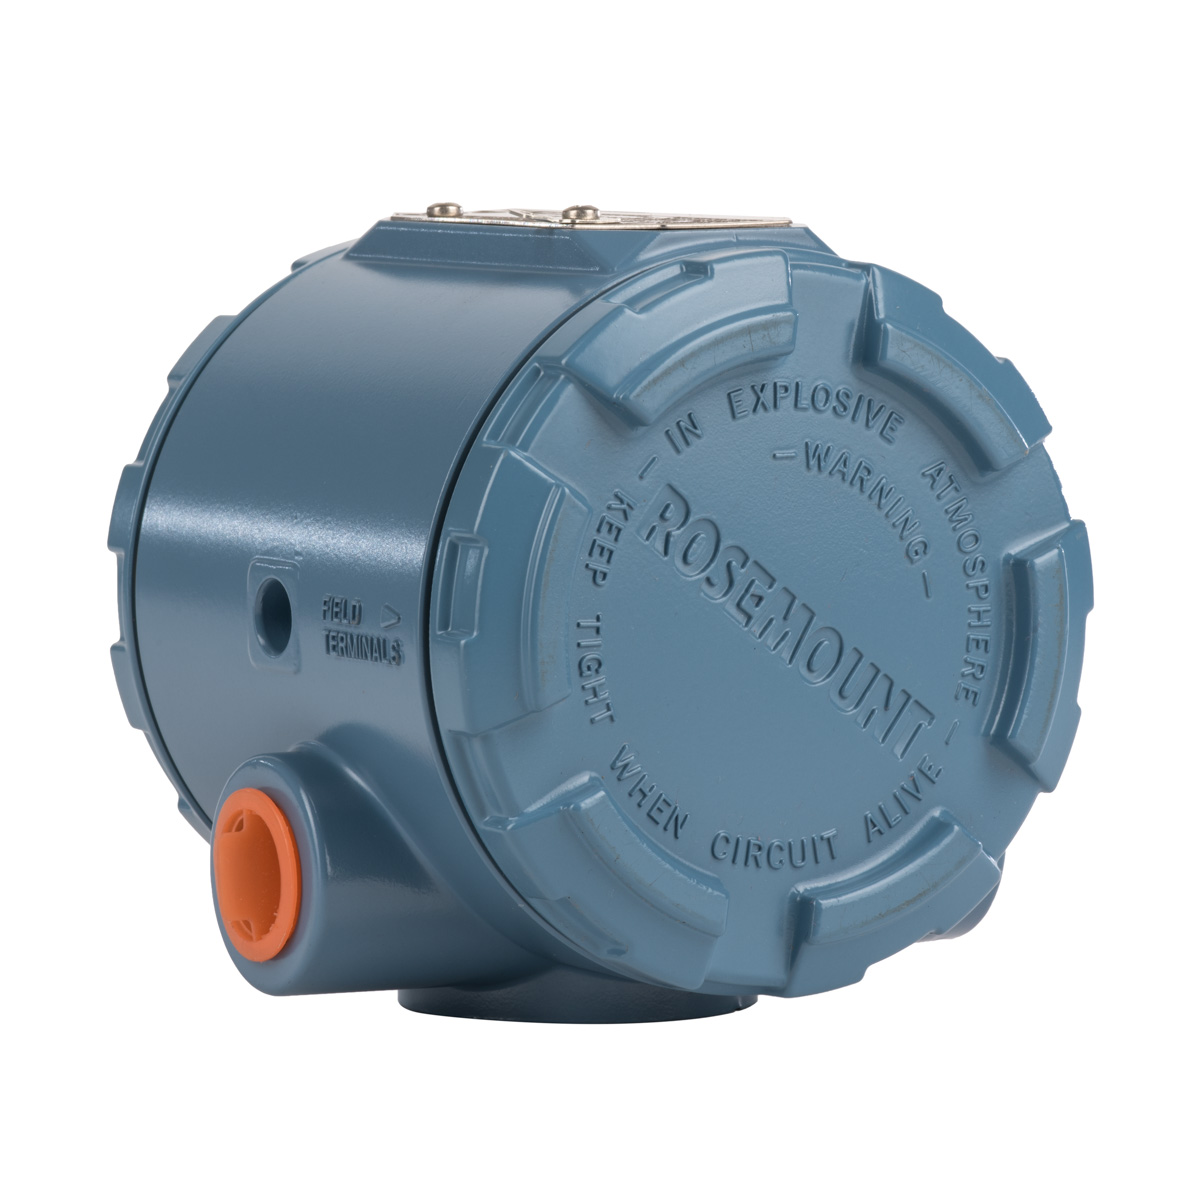 Manual Rosemount 3144P Temperature Transmitter Source · Rosemount 3144P  Temperature Transmitter